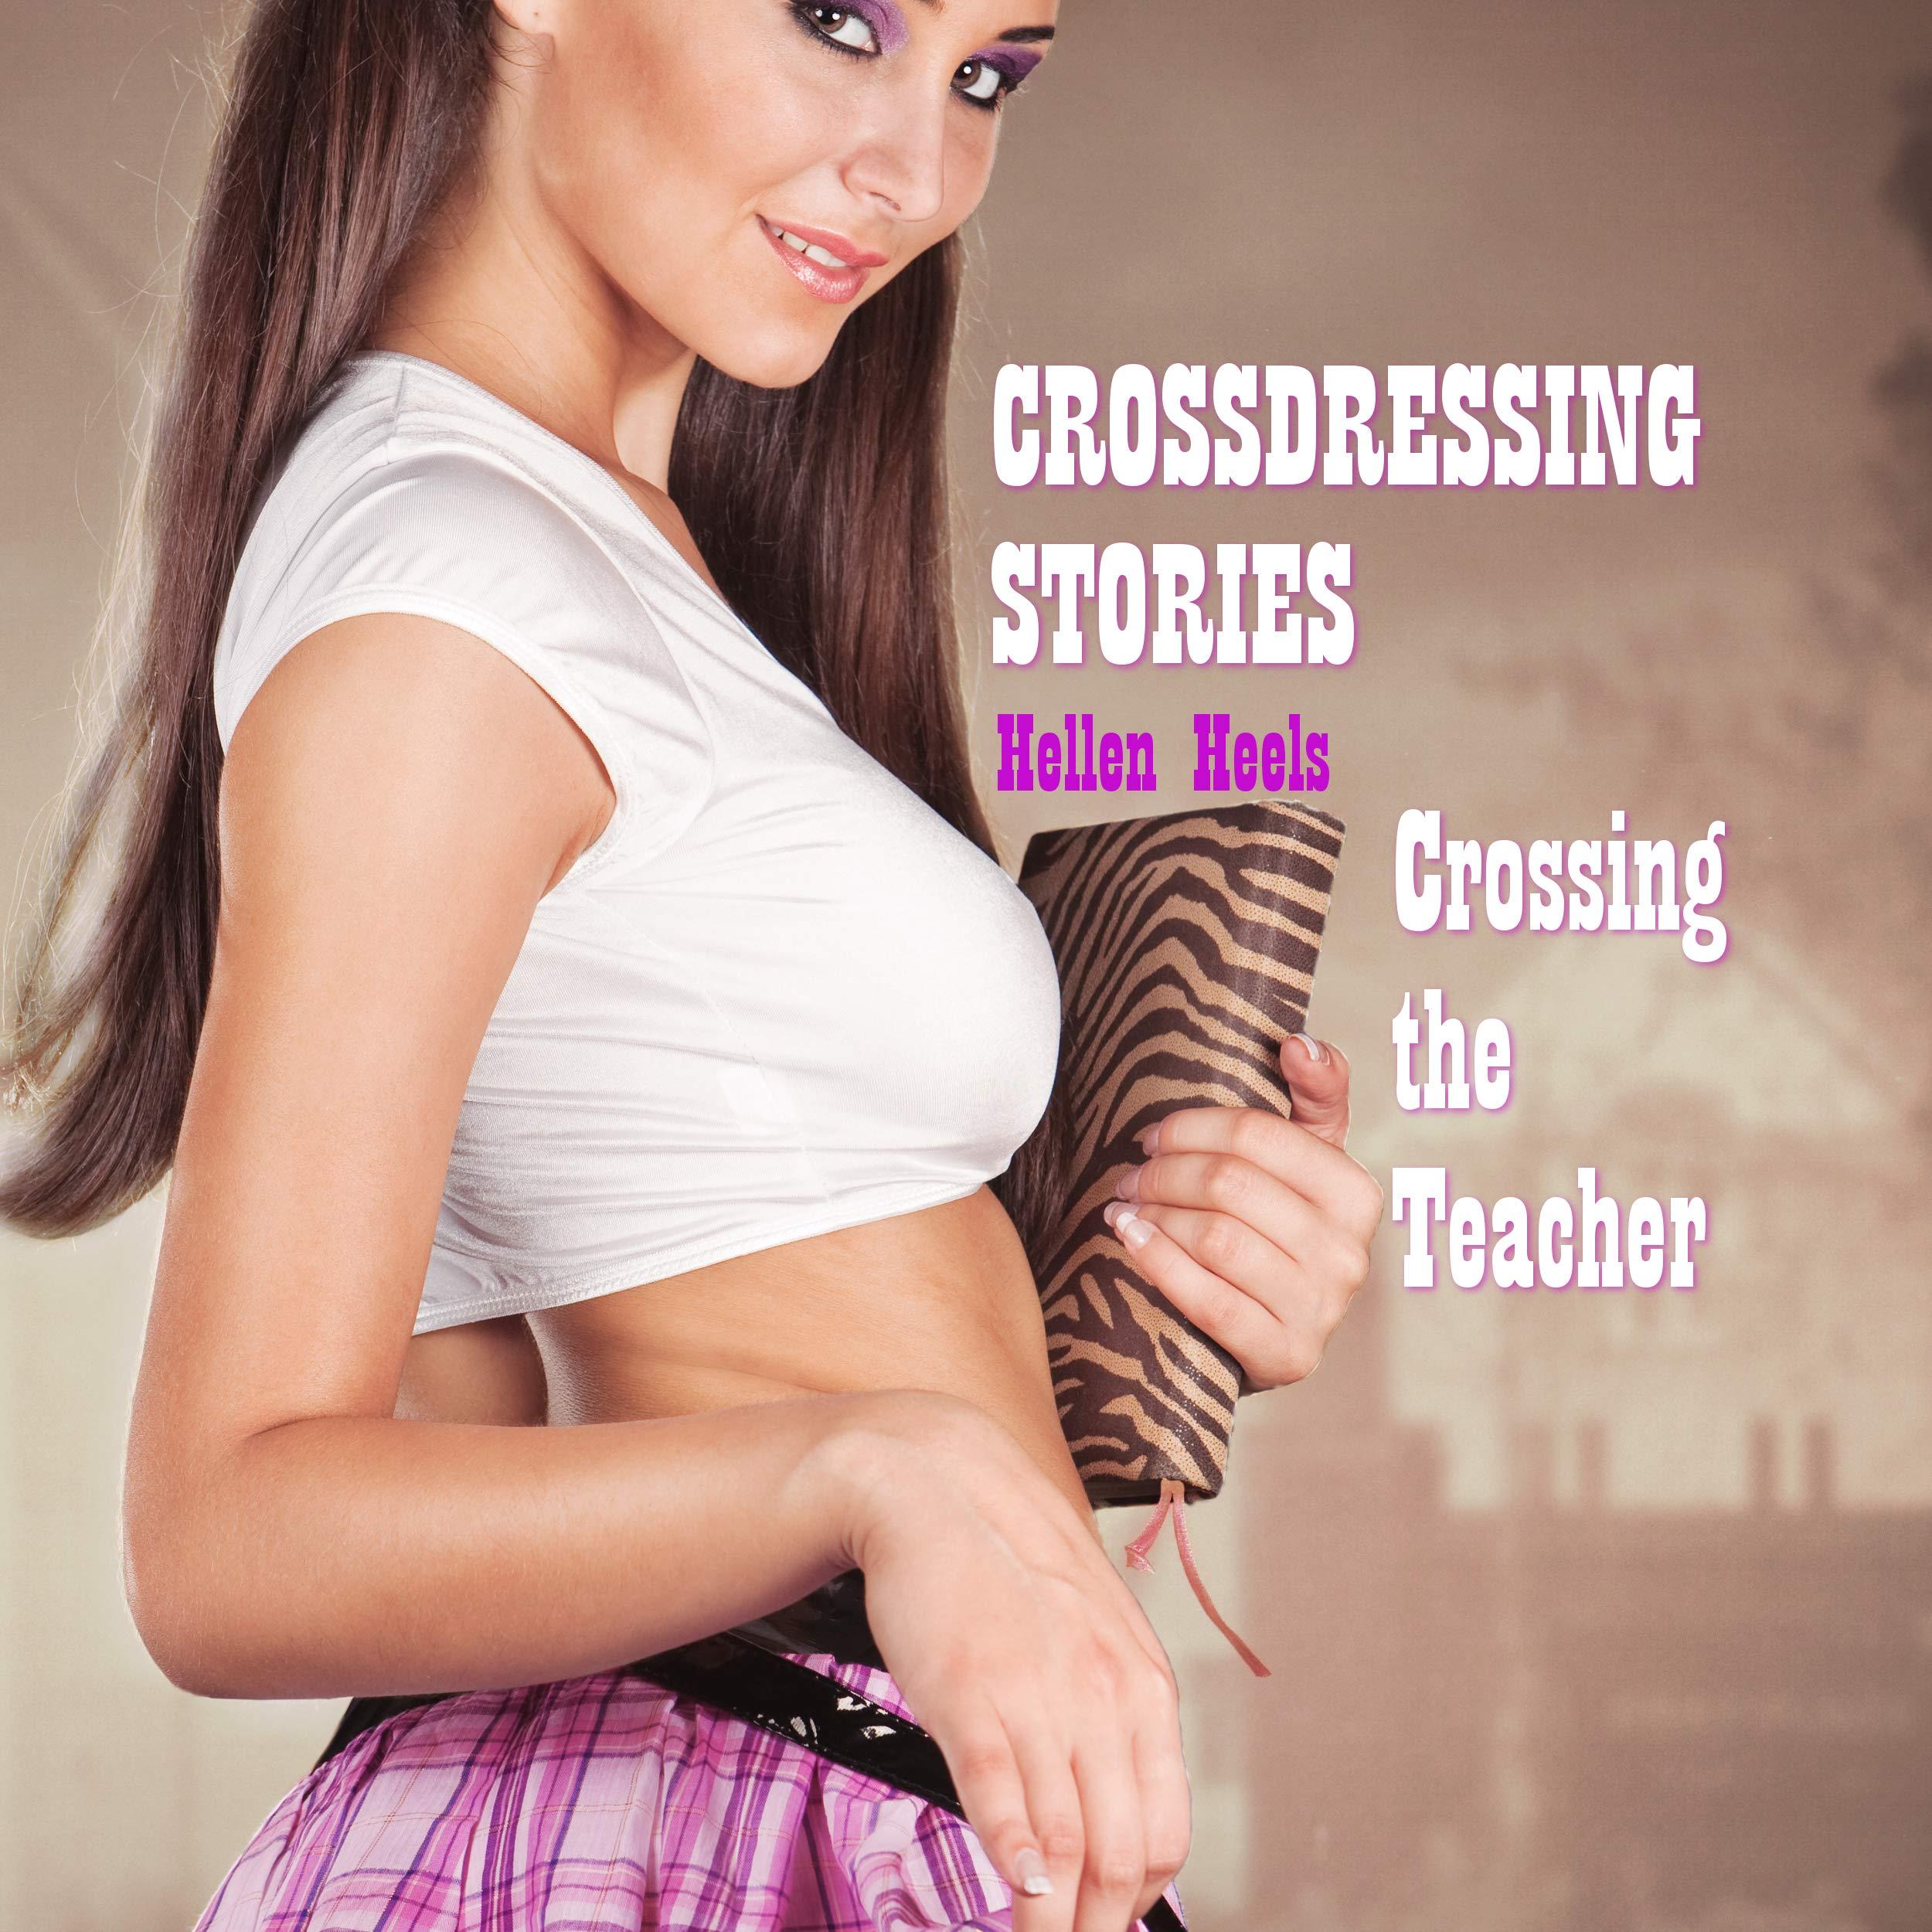 Stories crossdresser T